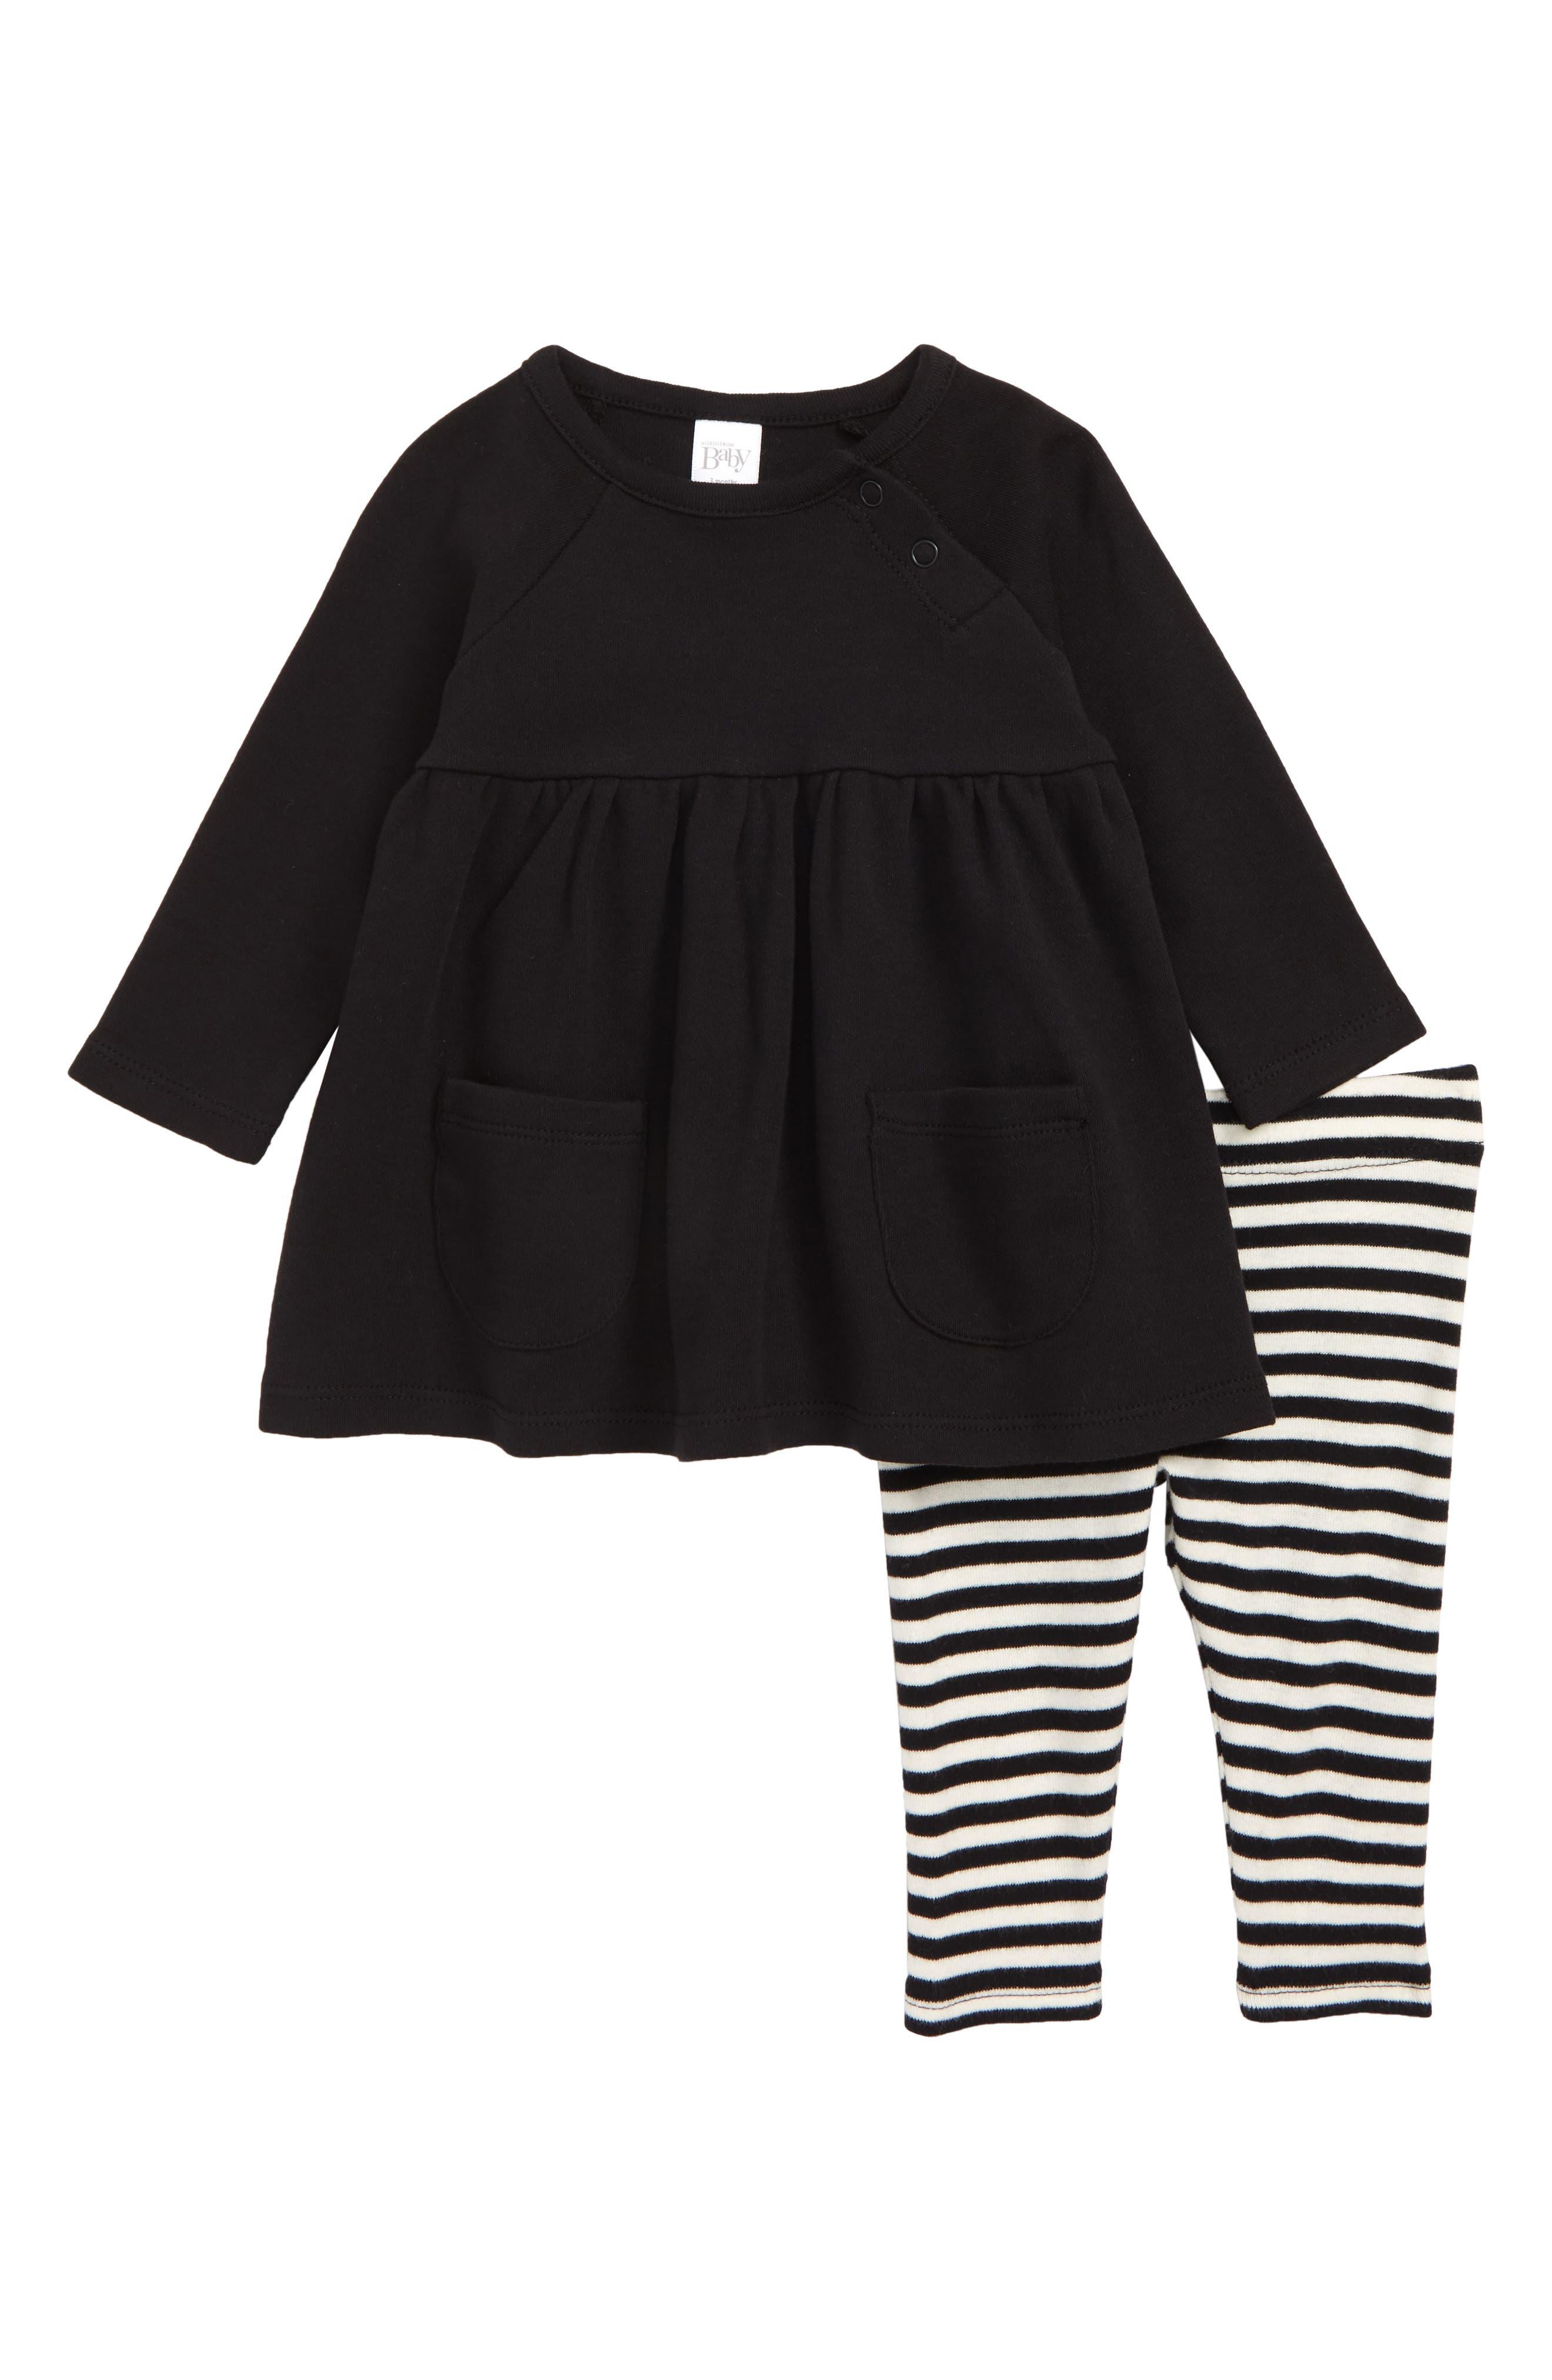 NORDSTROM BABY, Pocket Dress & Leggings Set, Main thumbnail 1, color, BLACK